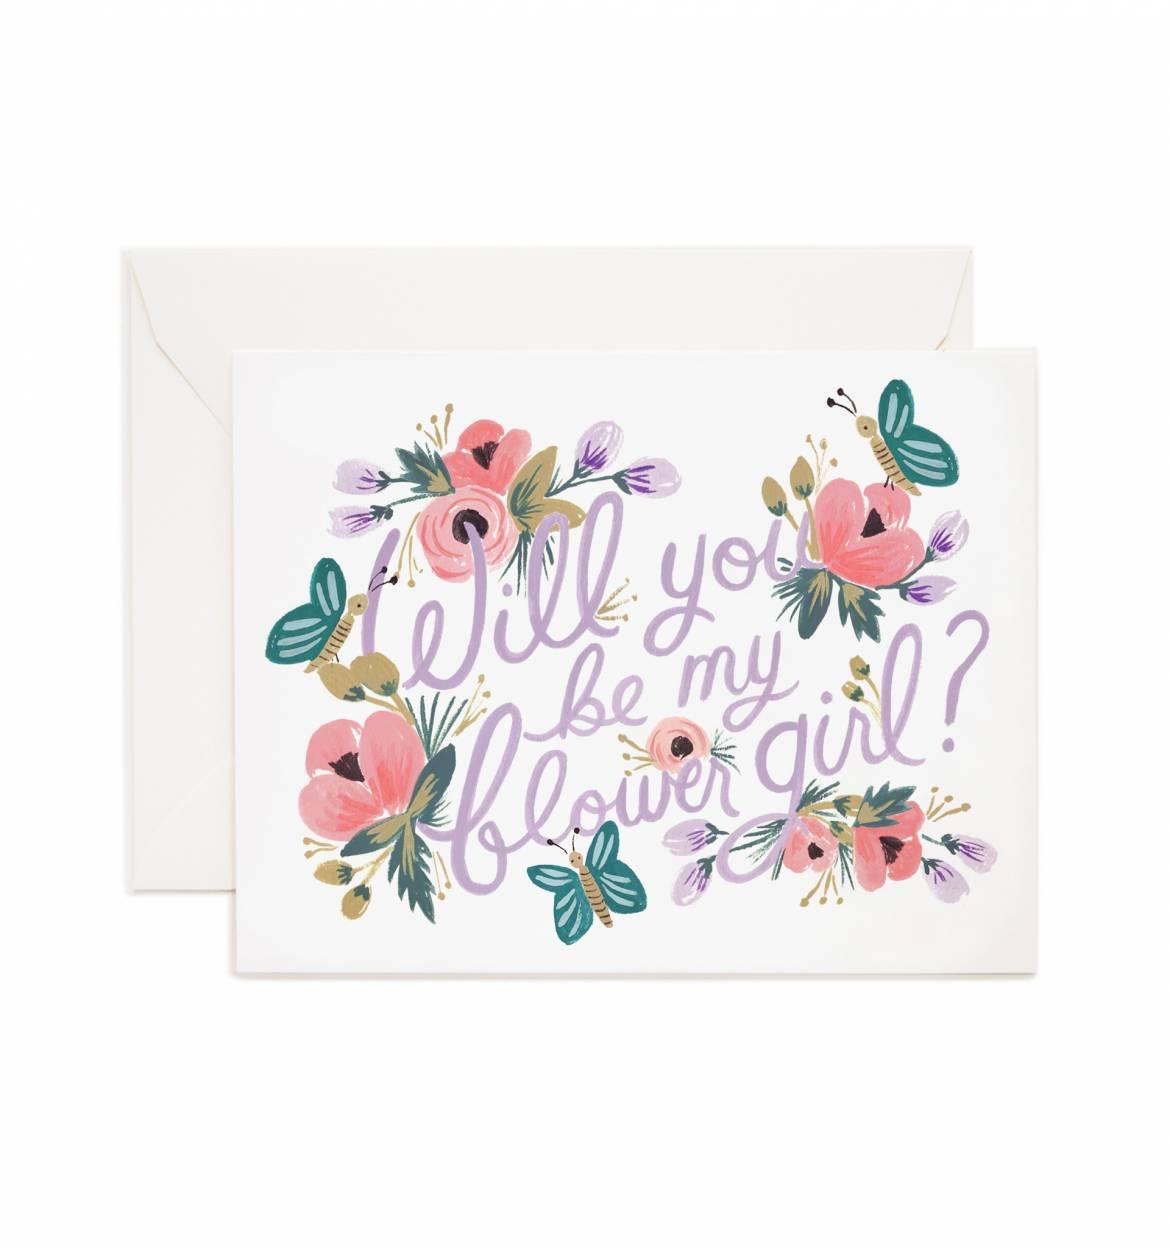 will-you-be-my-flower-girl-wedding-card-01.jpg